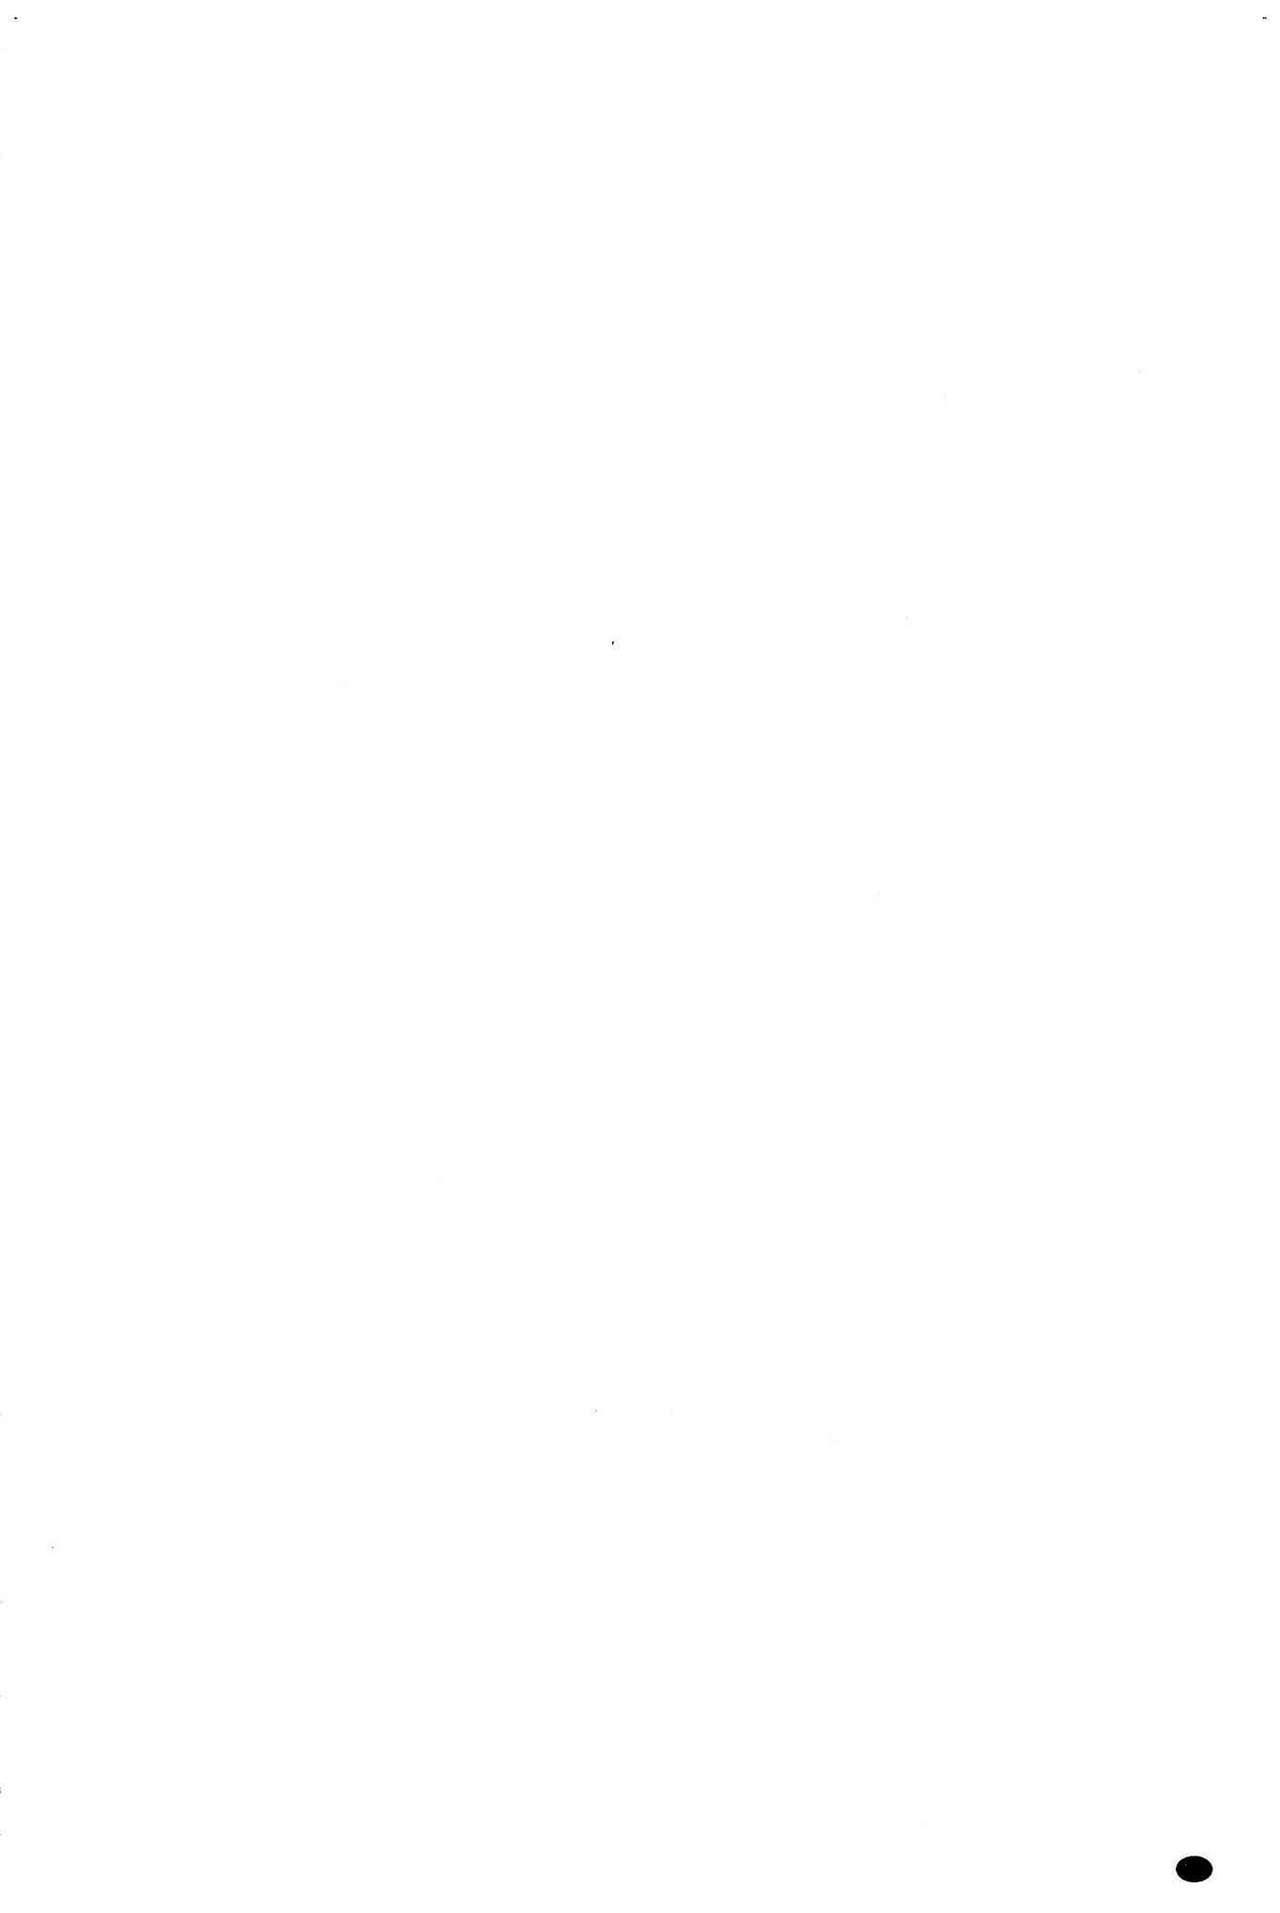 [Gotoh Akira]  21-ji no Onna ~Camera no Mae no Mesuinu~ 2 | 21時之女 ~鏡頭前的牝犬~ 2 [Chinese] 159